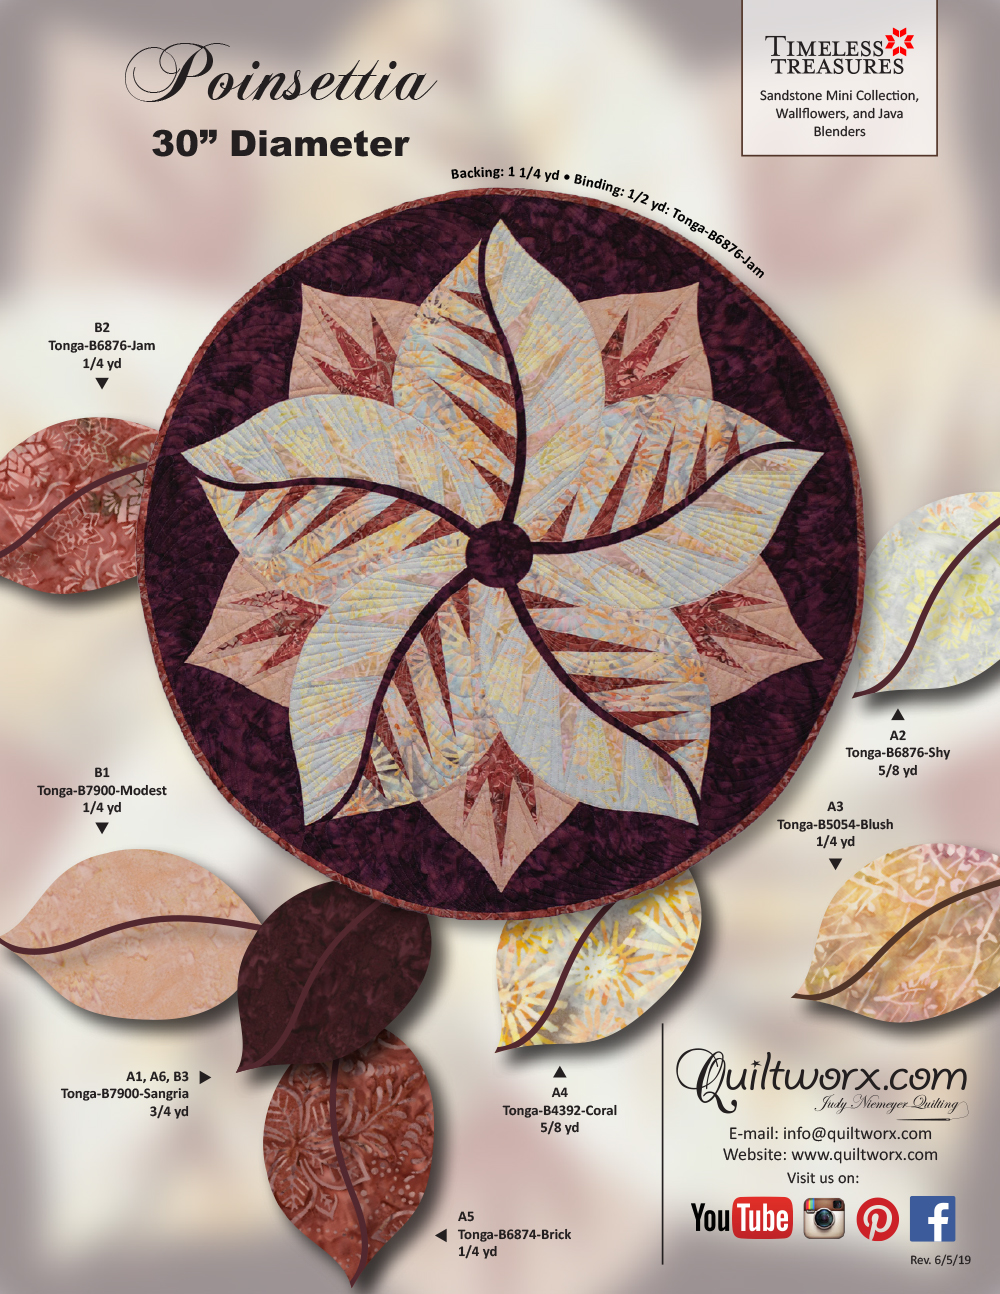 Poinsettia-Sandstone-1pg-KS-1